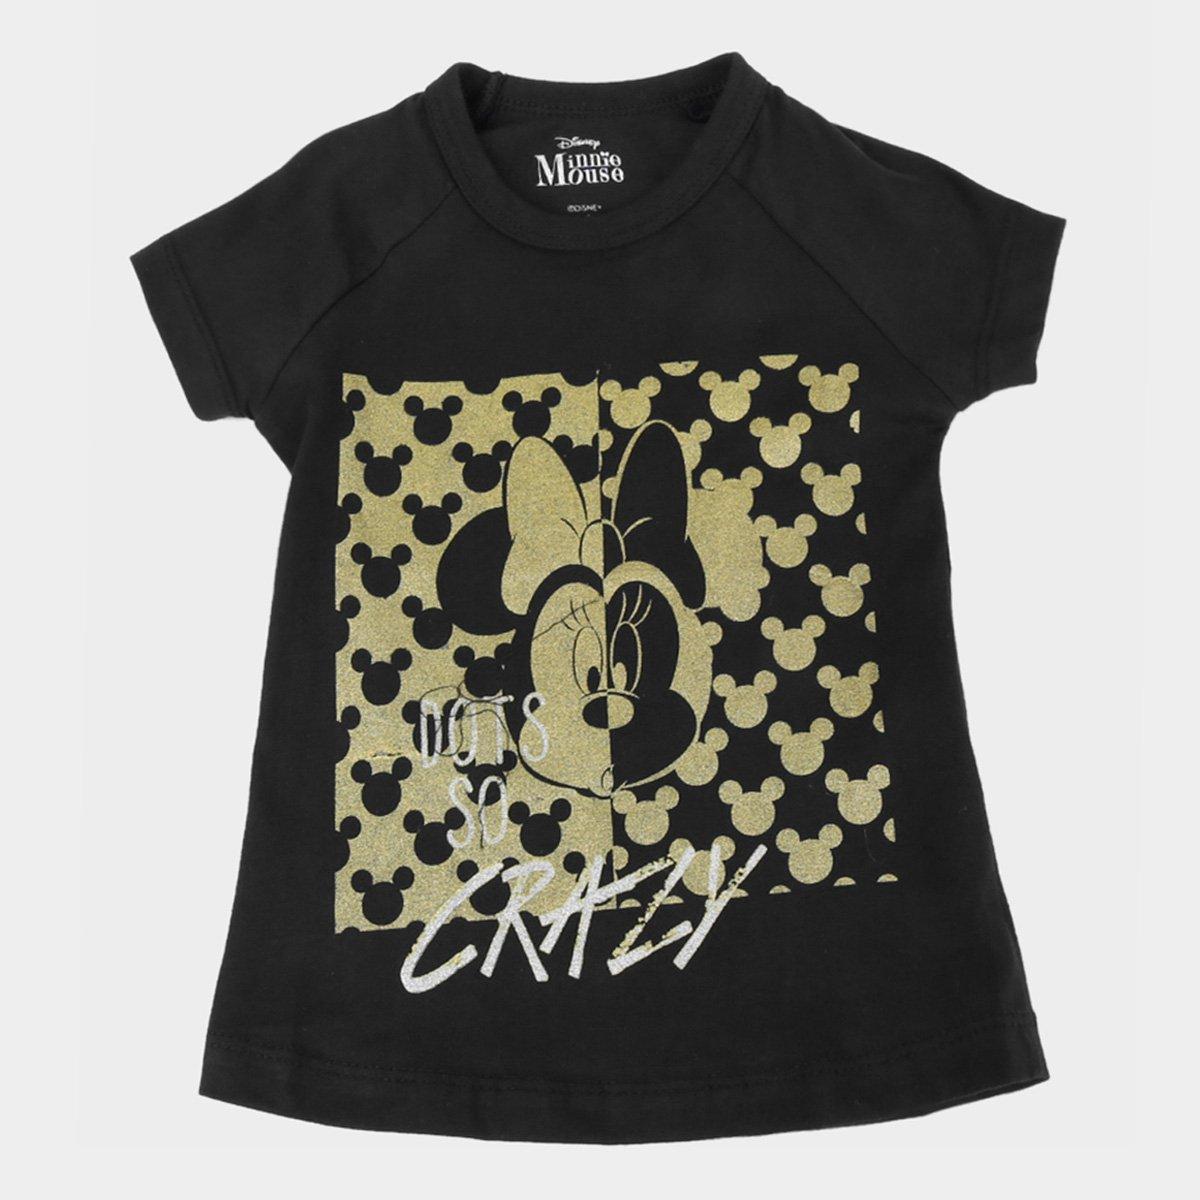 Blusa Infantil Disney Crazy Minnie Feminina